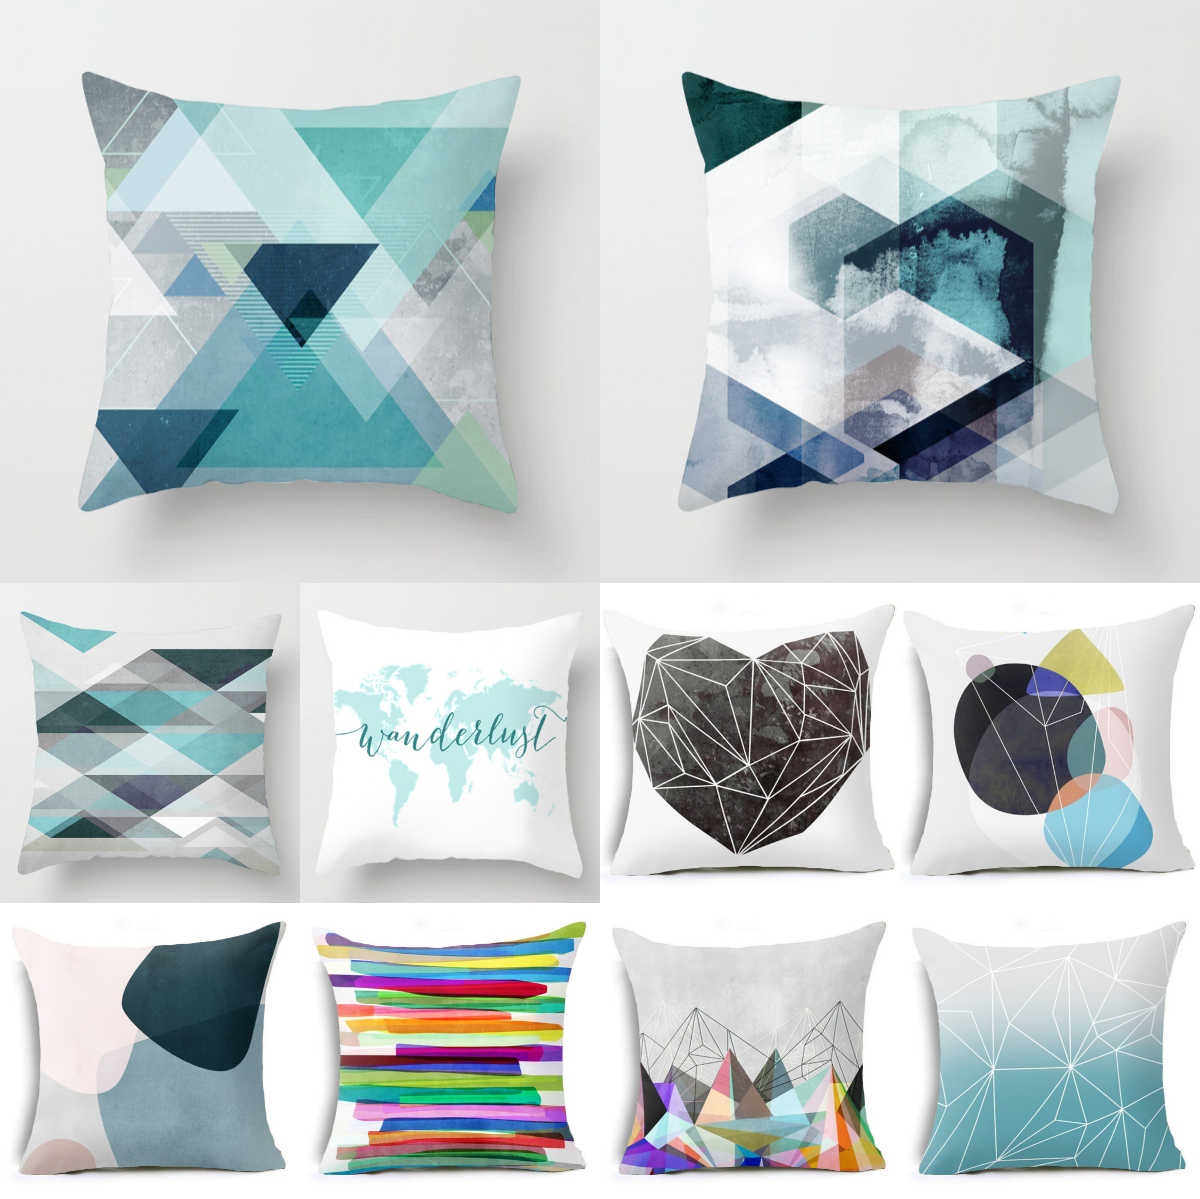 blue geometric pillow case 45 45cm cushion cover polyester cushions for sofa car throw pillow covers home decor throw pillows